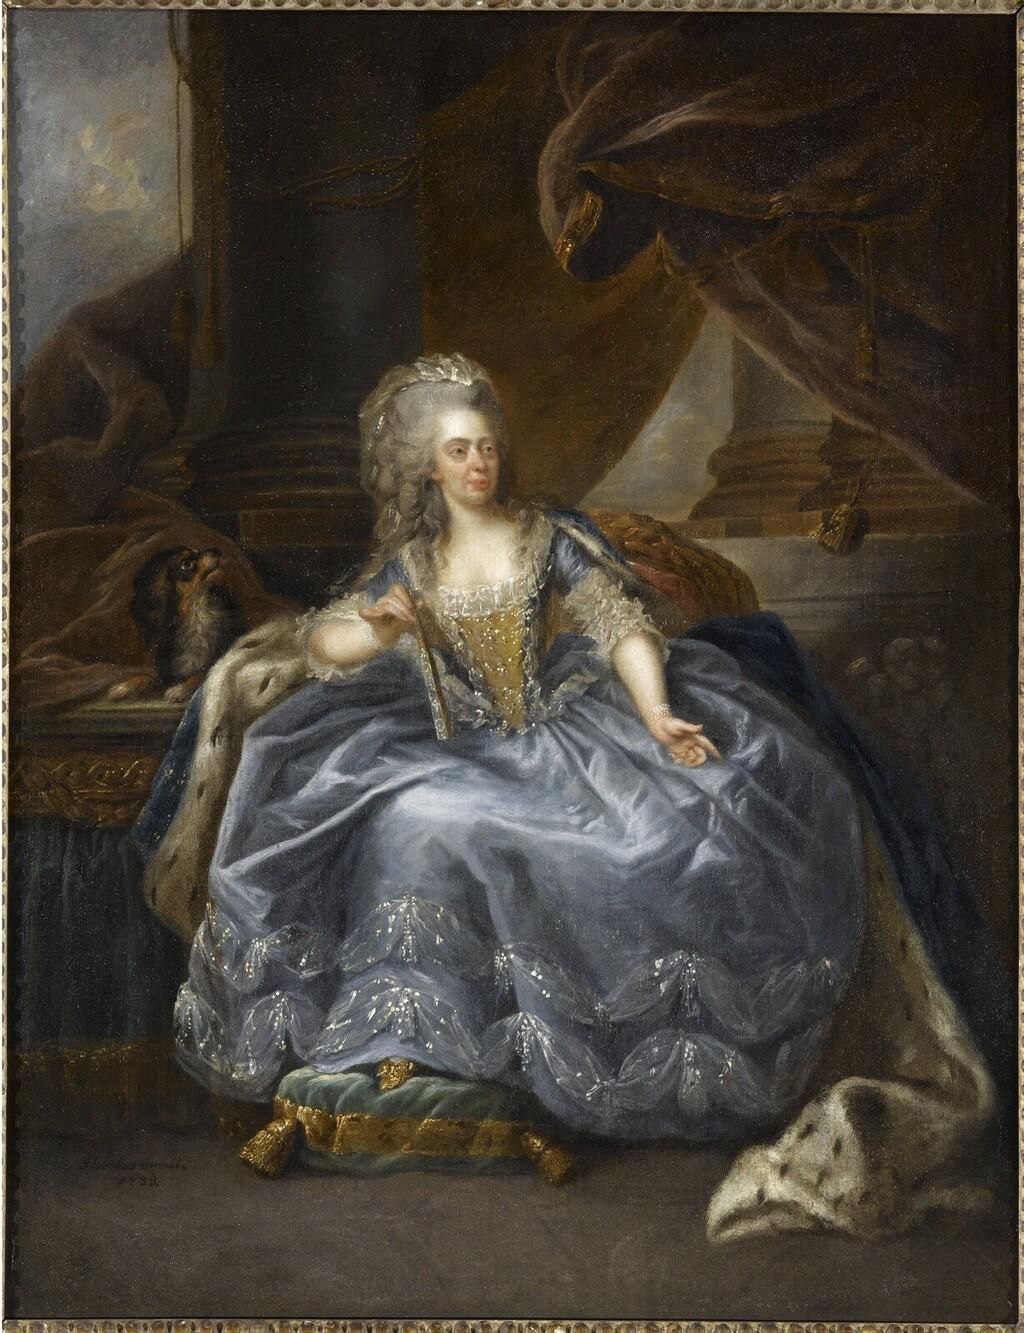 Marie-Adélaïde de France, dite Madame Adélaïde - Page 2 Madame42